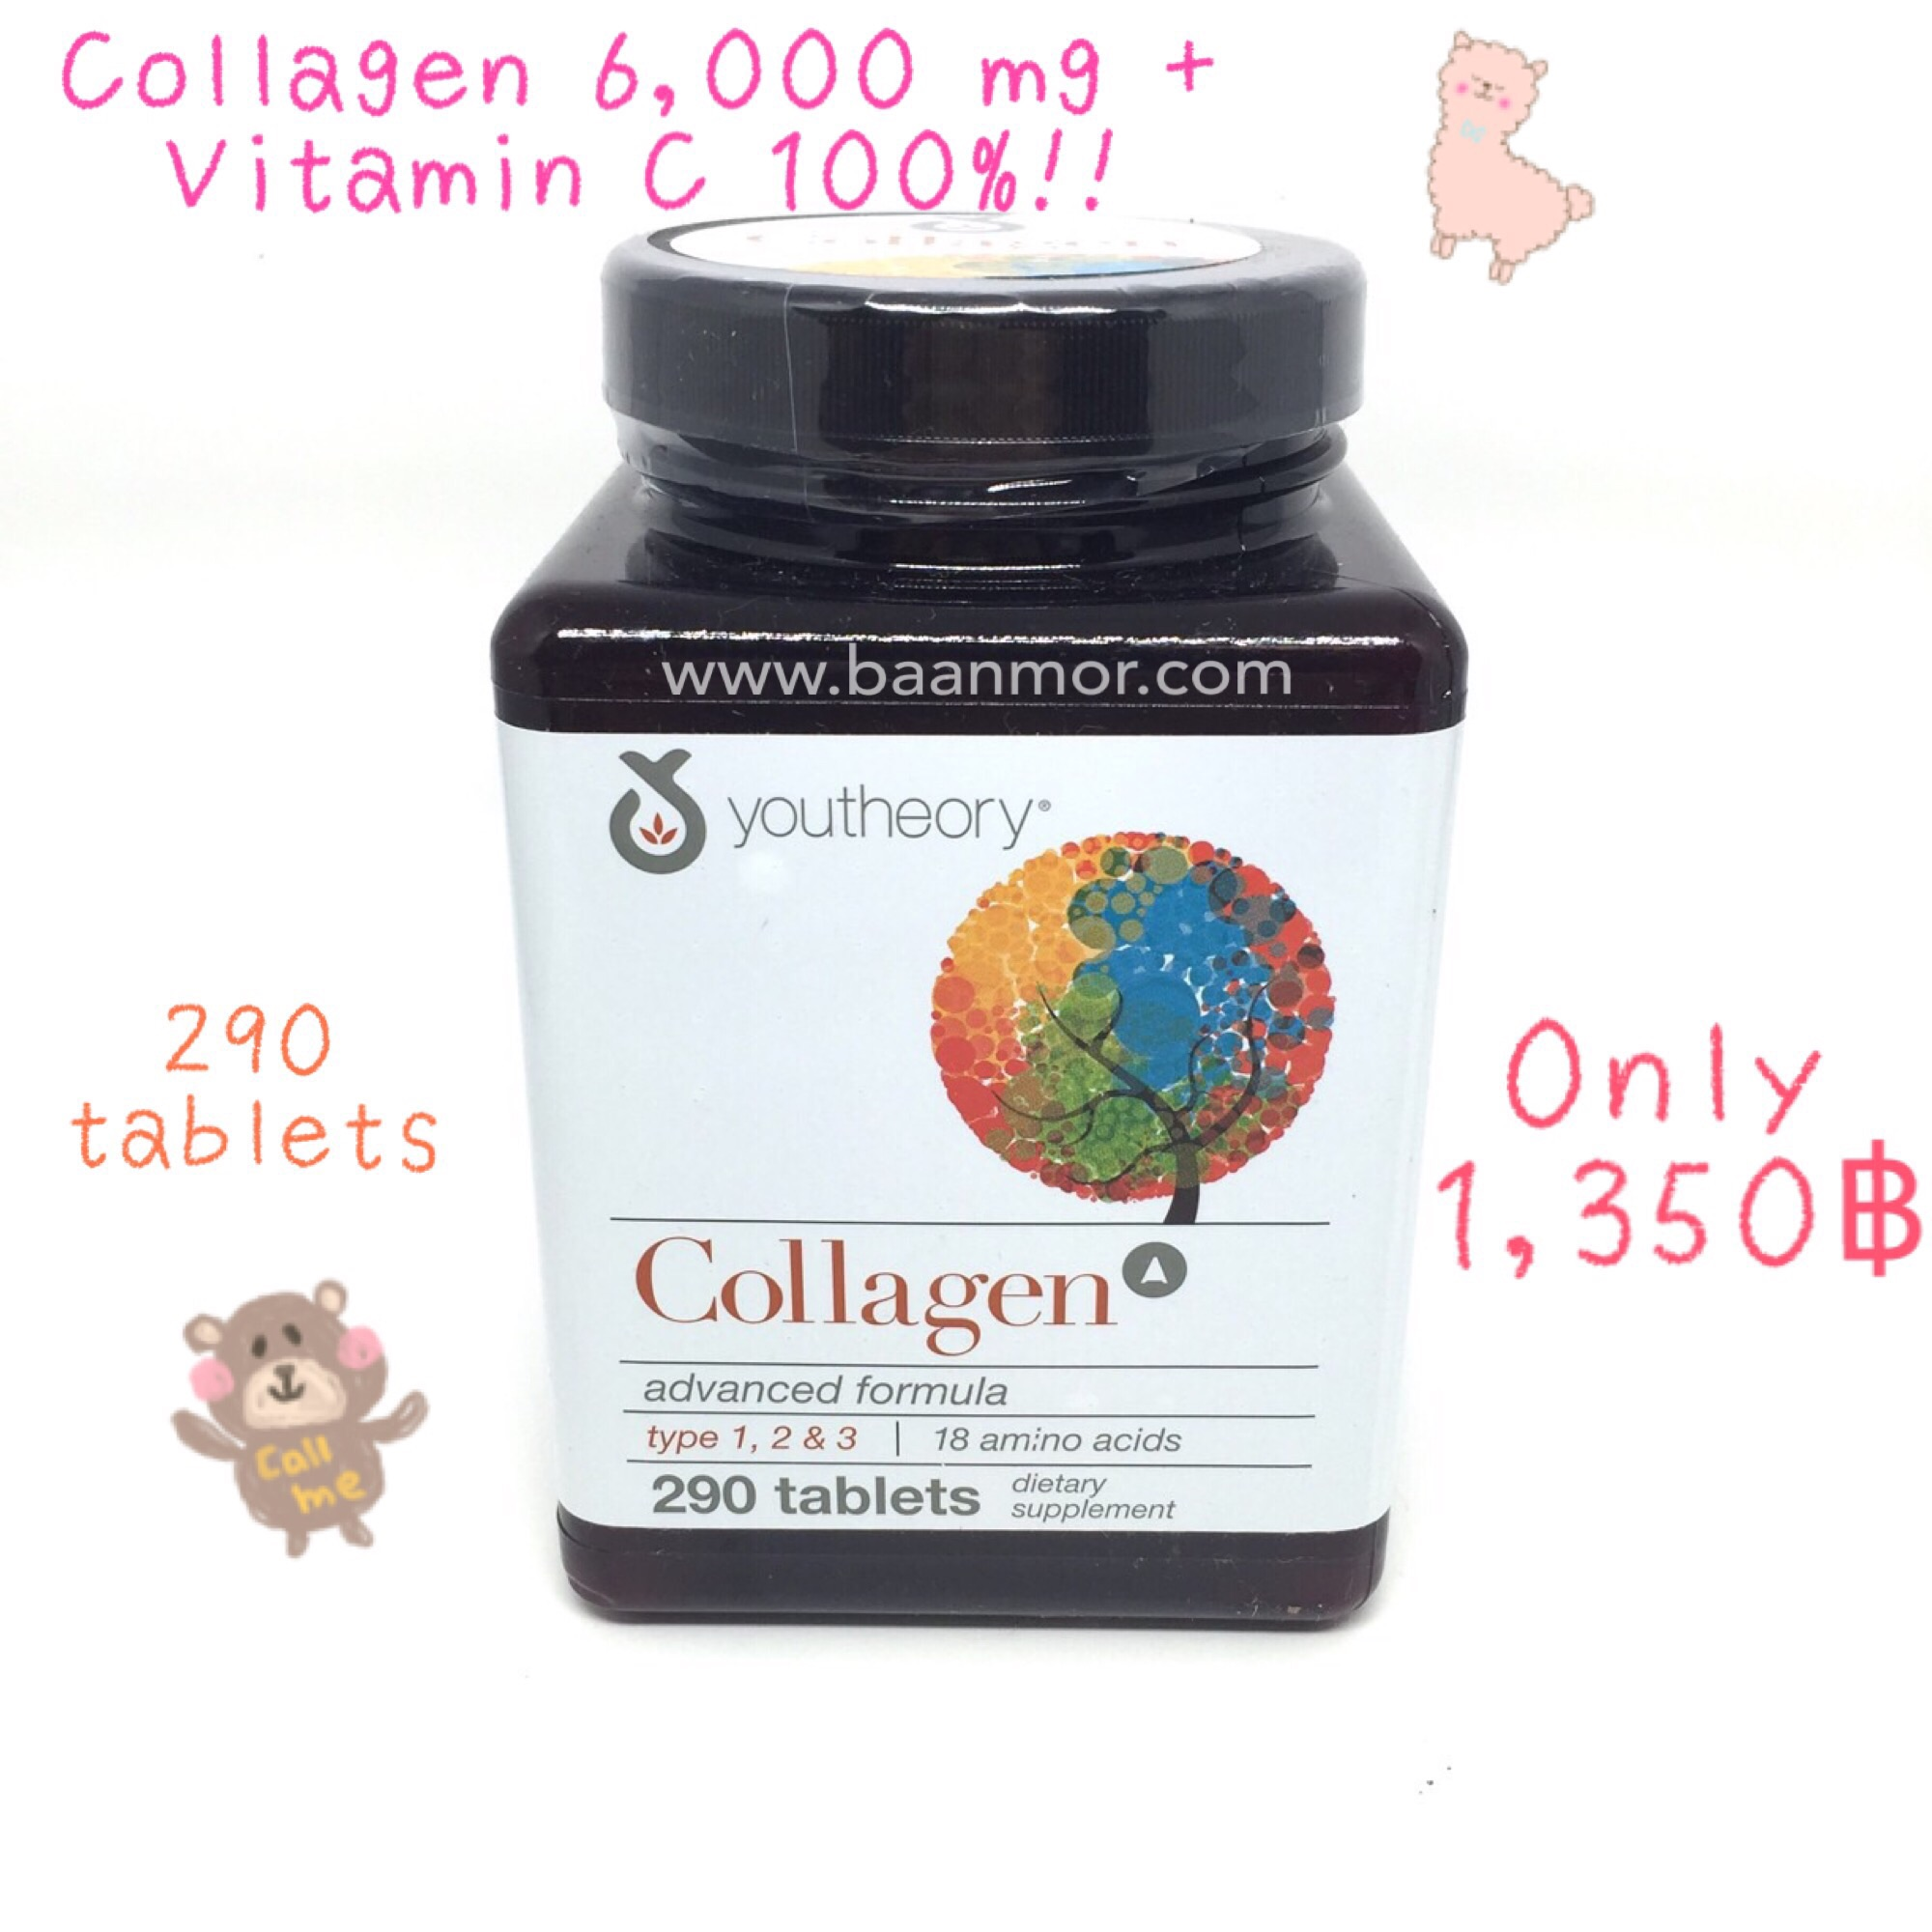 Collagen type 1,2&3 + C 100% กระปุกใหญ่ ไซส์สุดคุ้มจ้า 290เม็ด! ผิวกระชับ เนียนผ่อง เต่งตึง